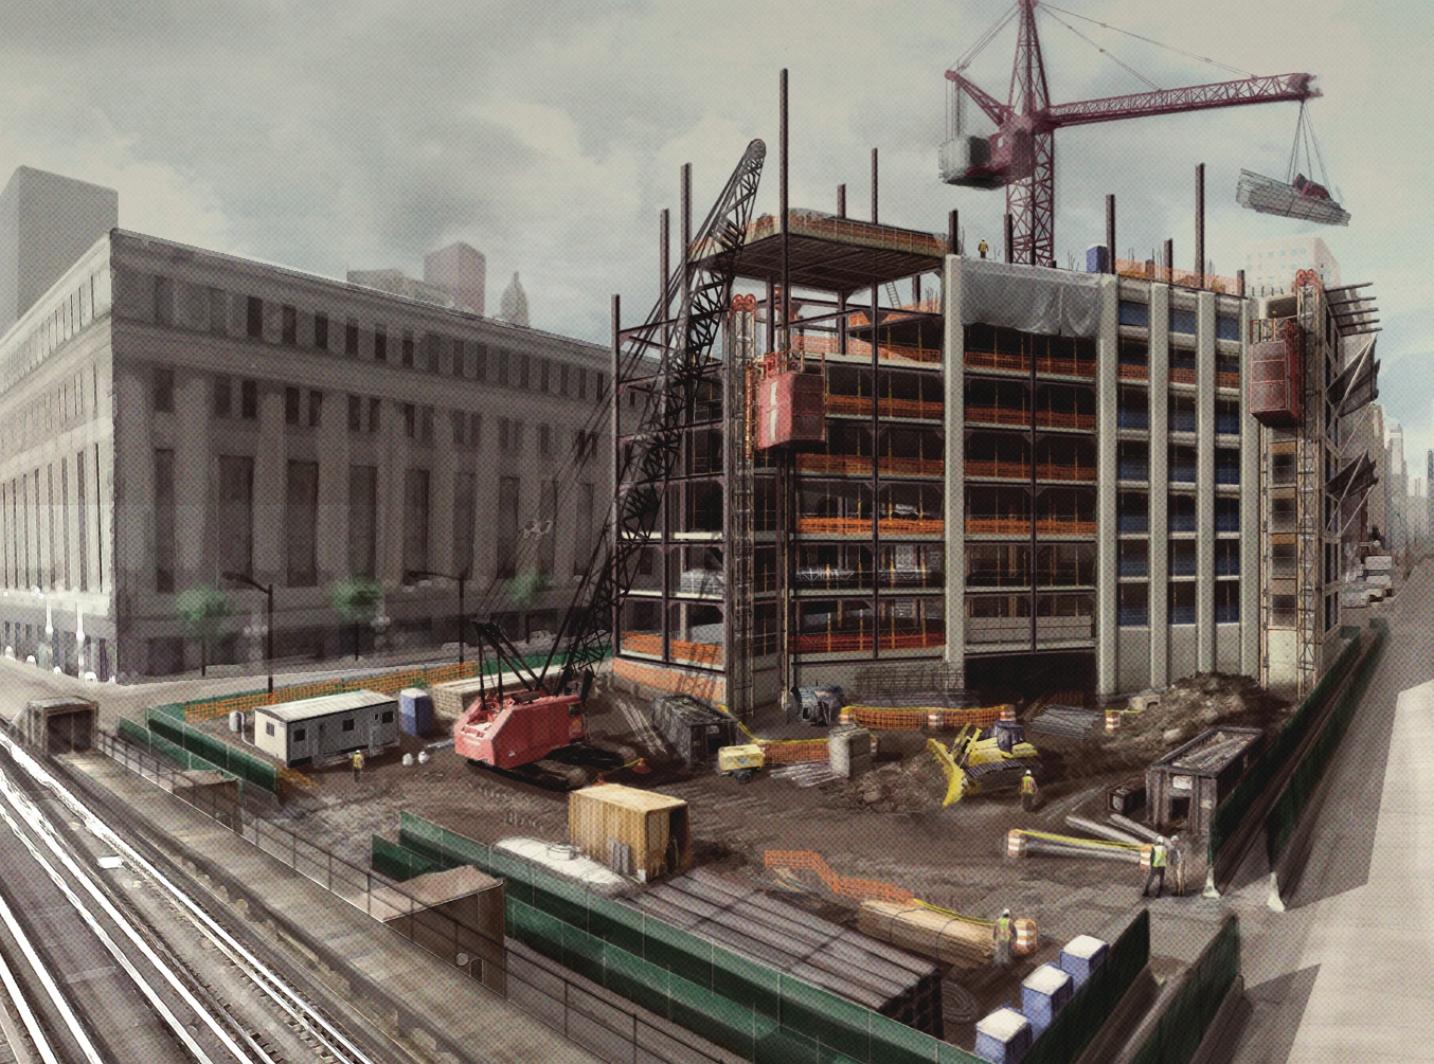 ConstructionSite_Concept.jpg